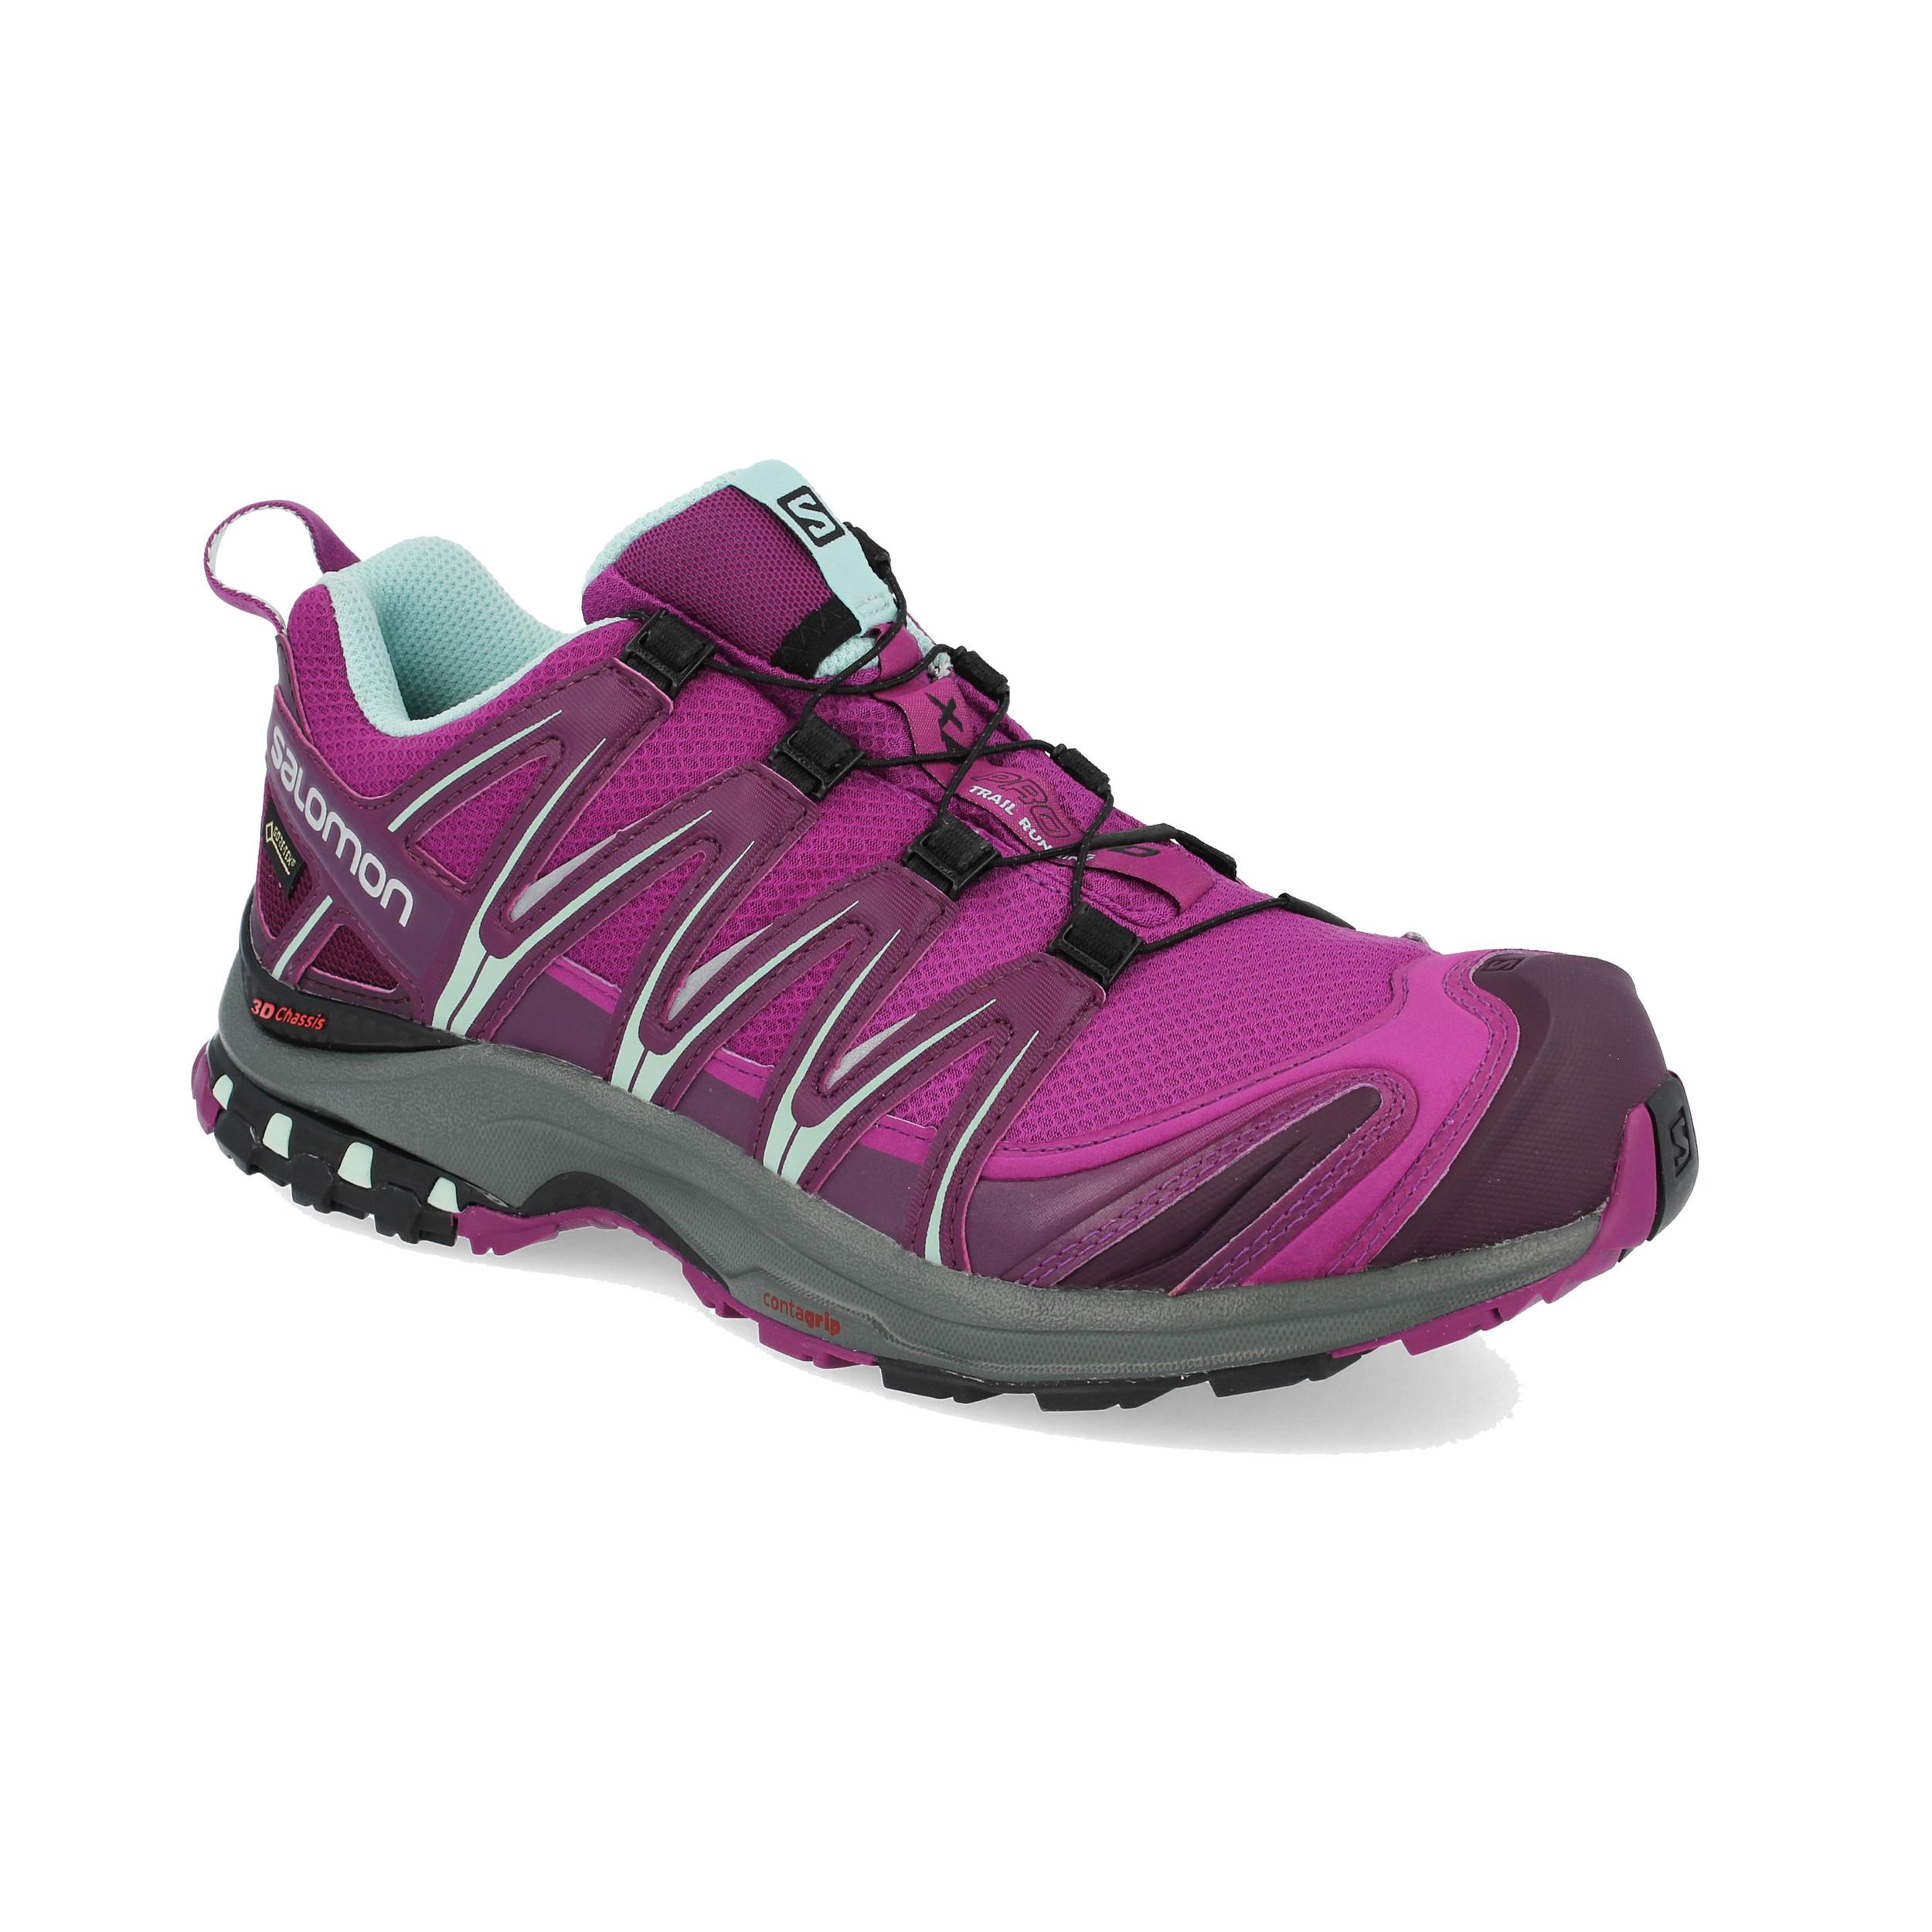 dd9a0f99302 Salomon Mujer Xa Pro 3d Gtx Sendero Correr Zapatos Zapatillas Violeta  Deporte